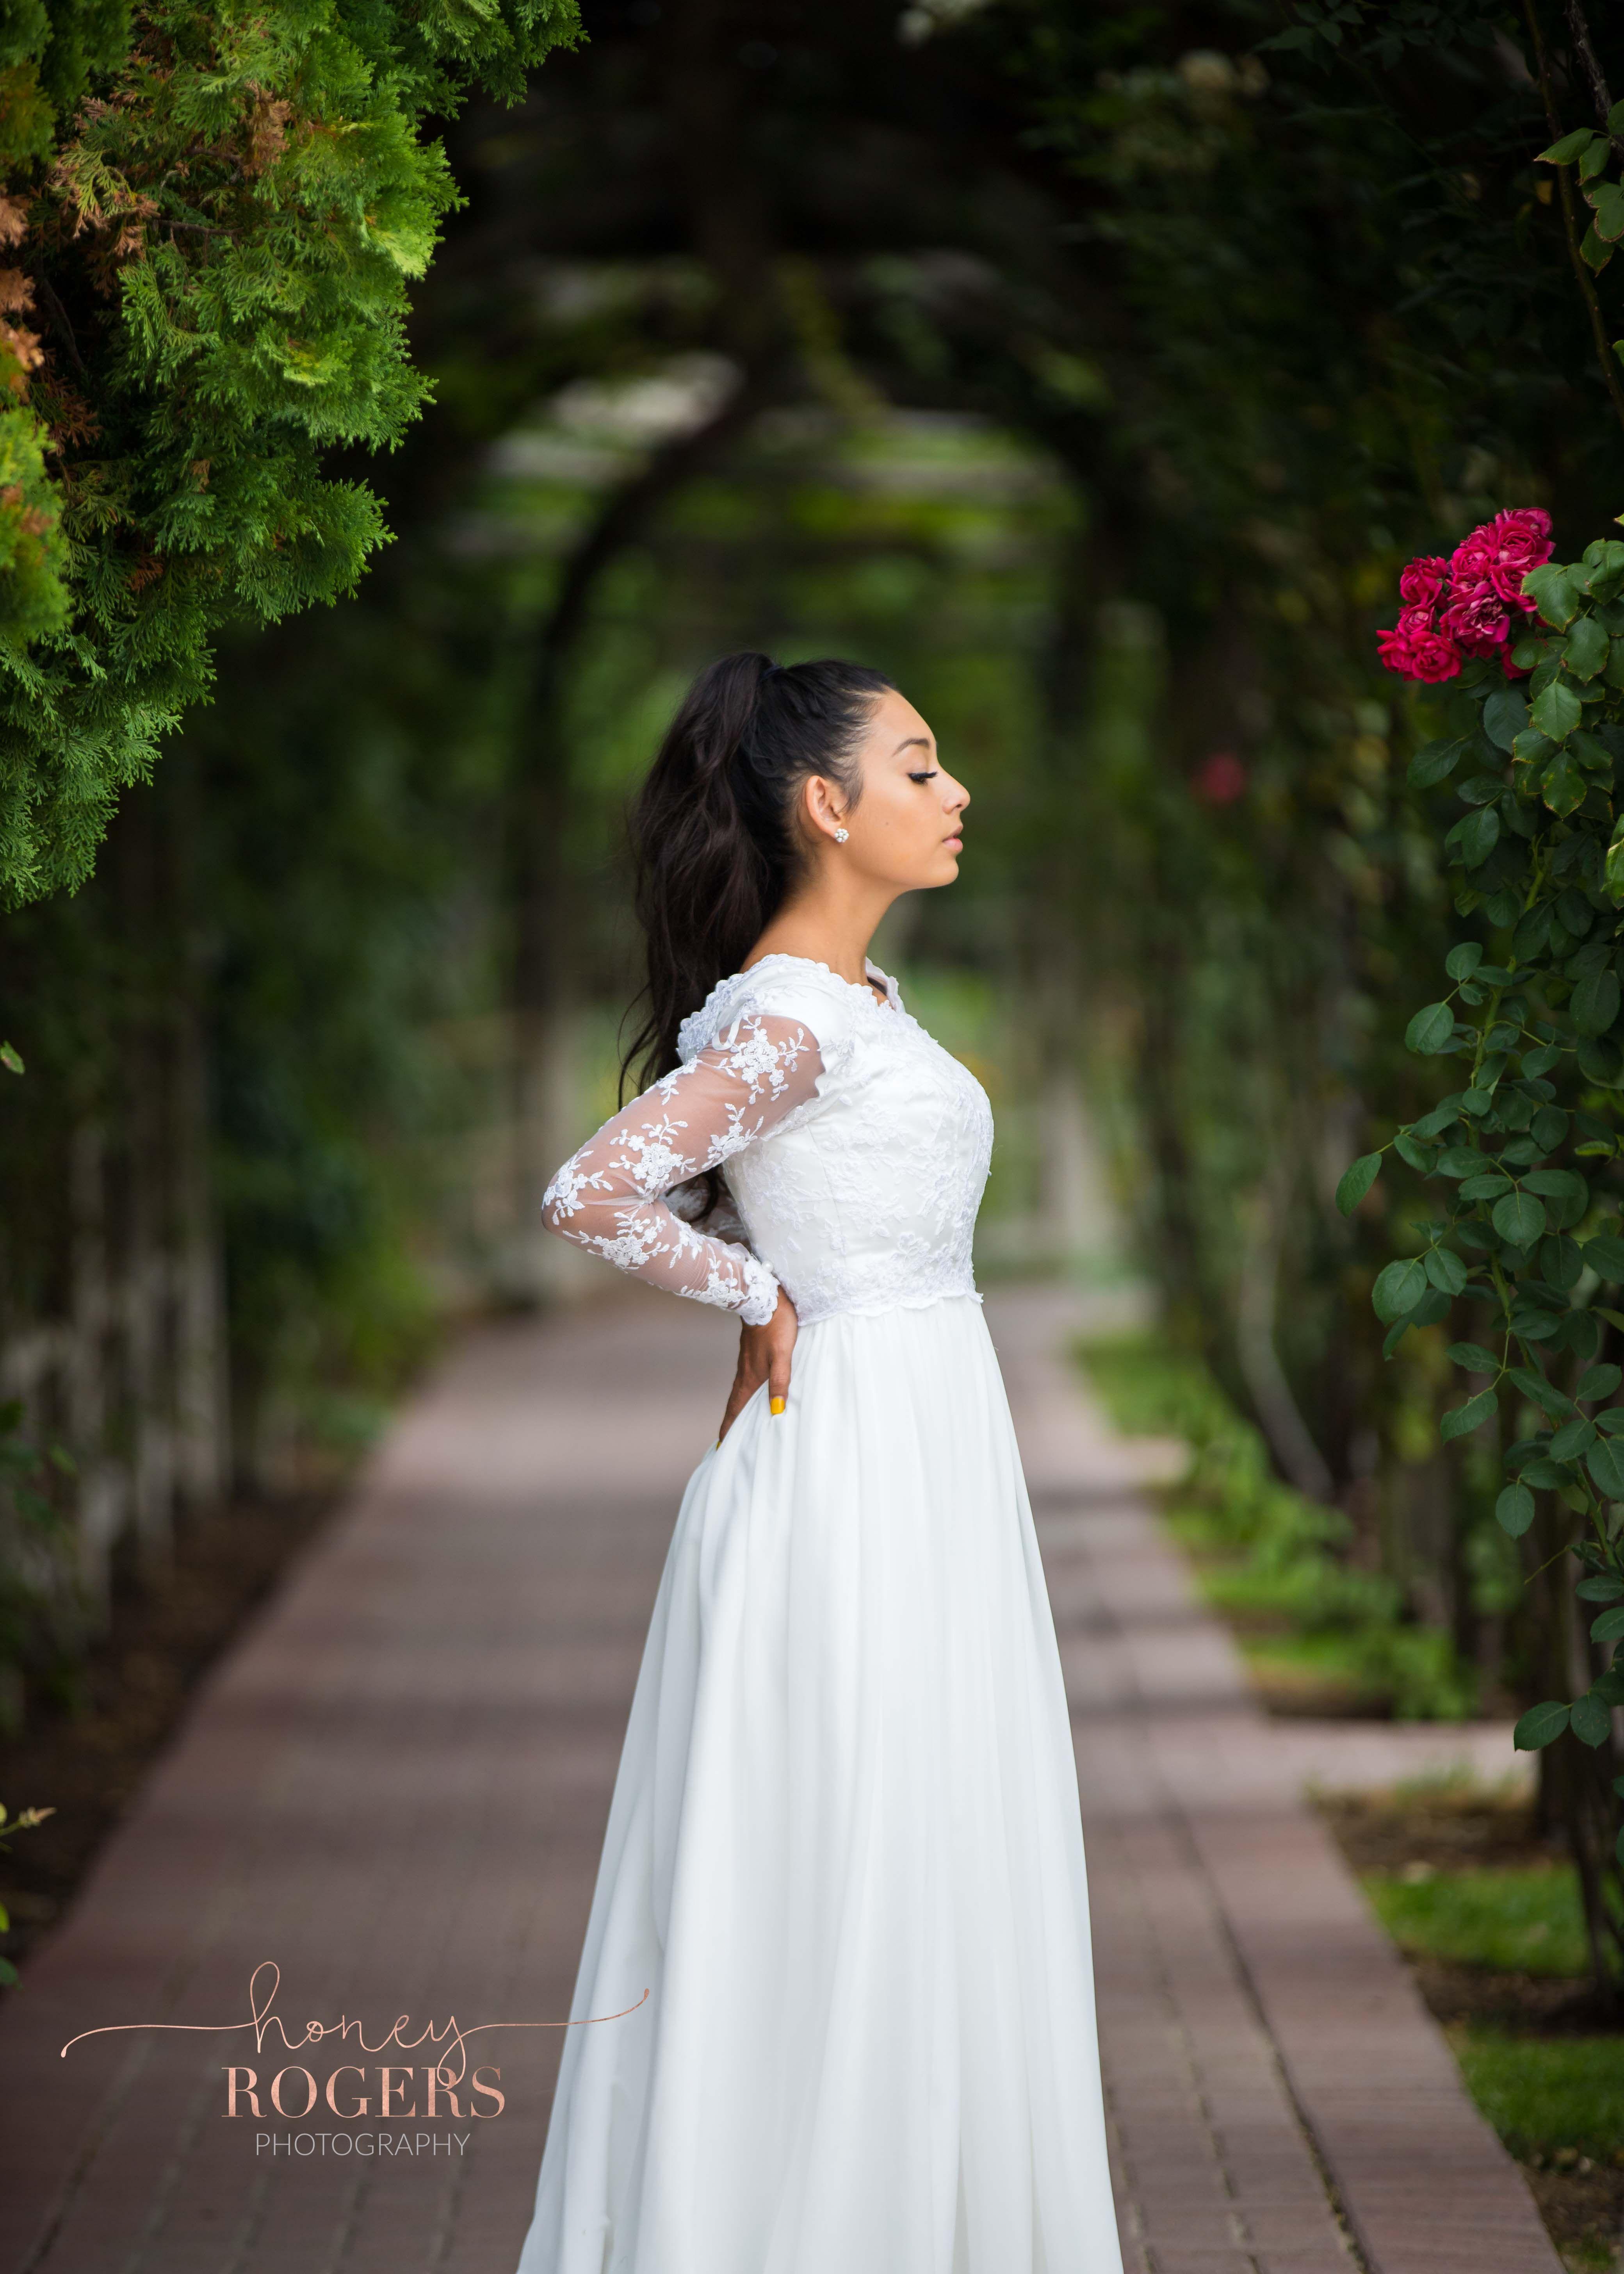 Bridals formals wedding photography temple wedding